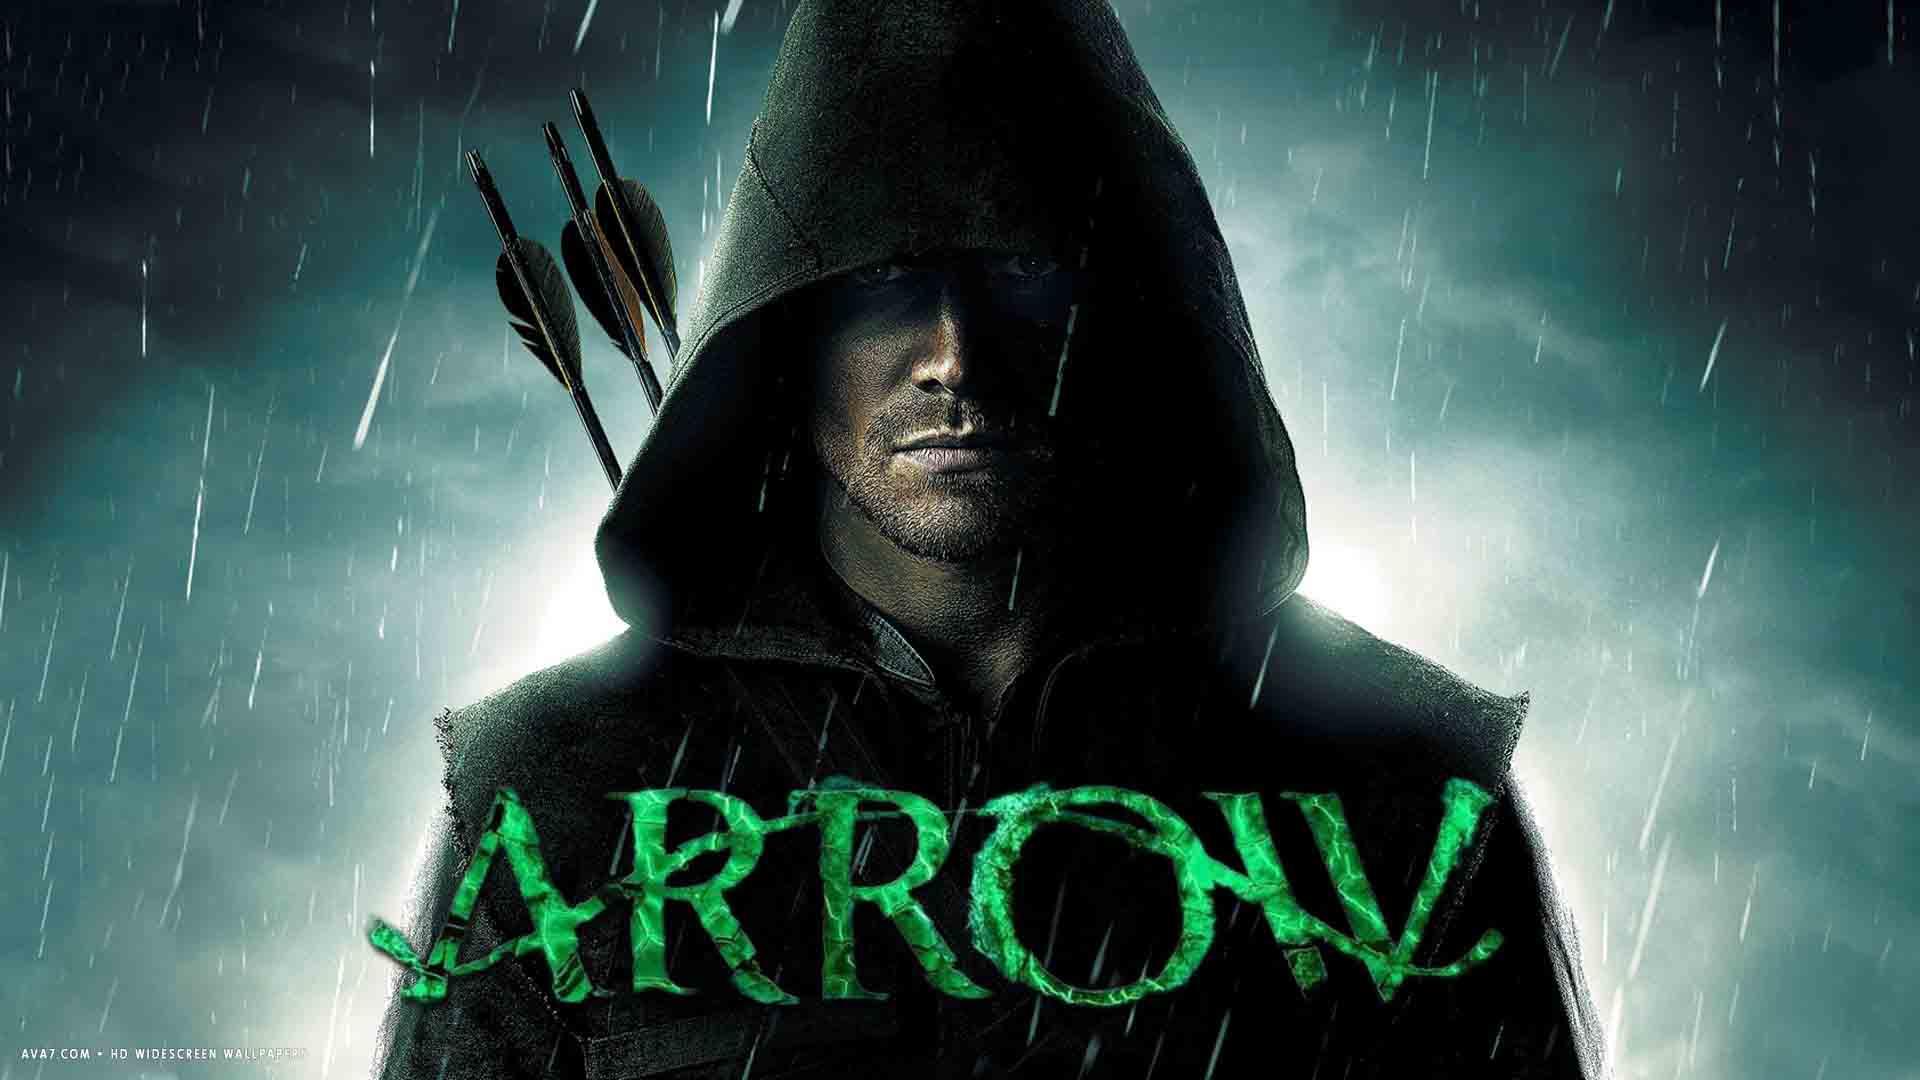 Ende für Arrow nach Staffel 8